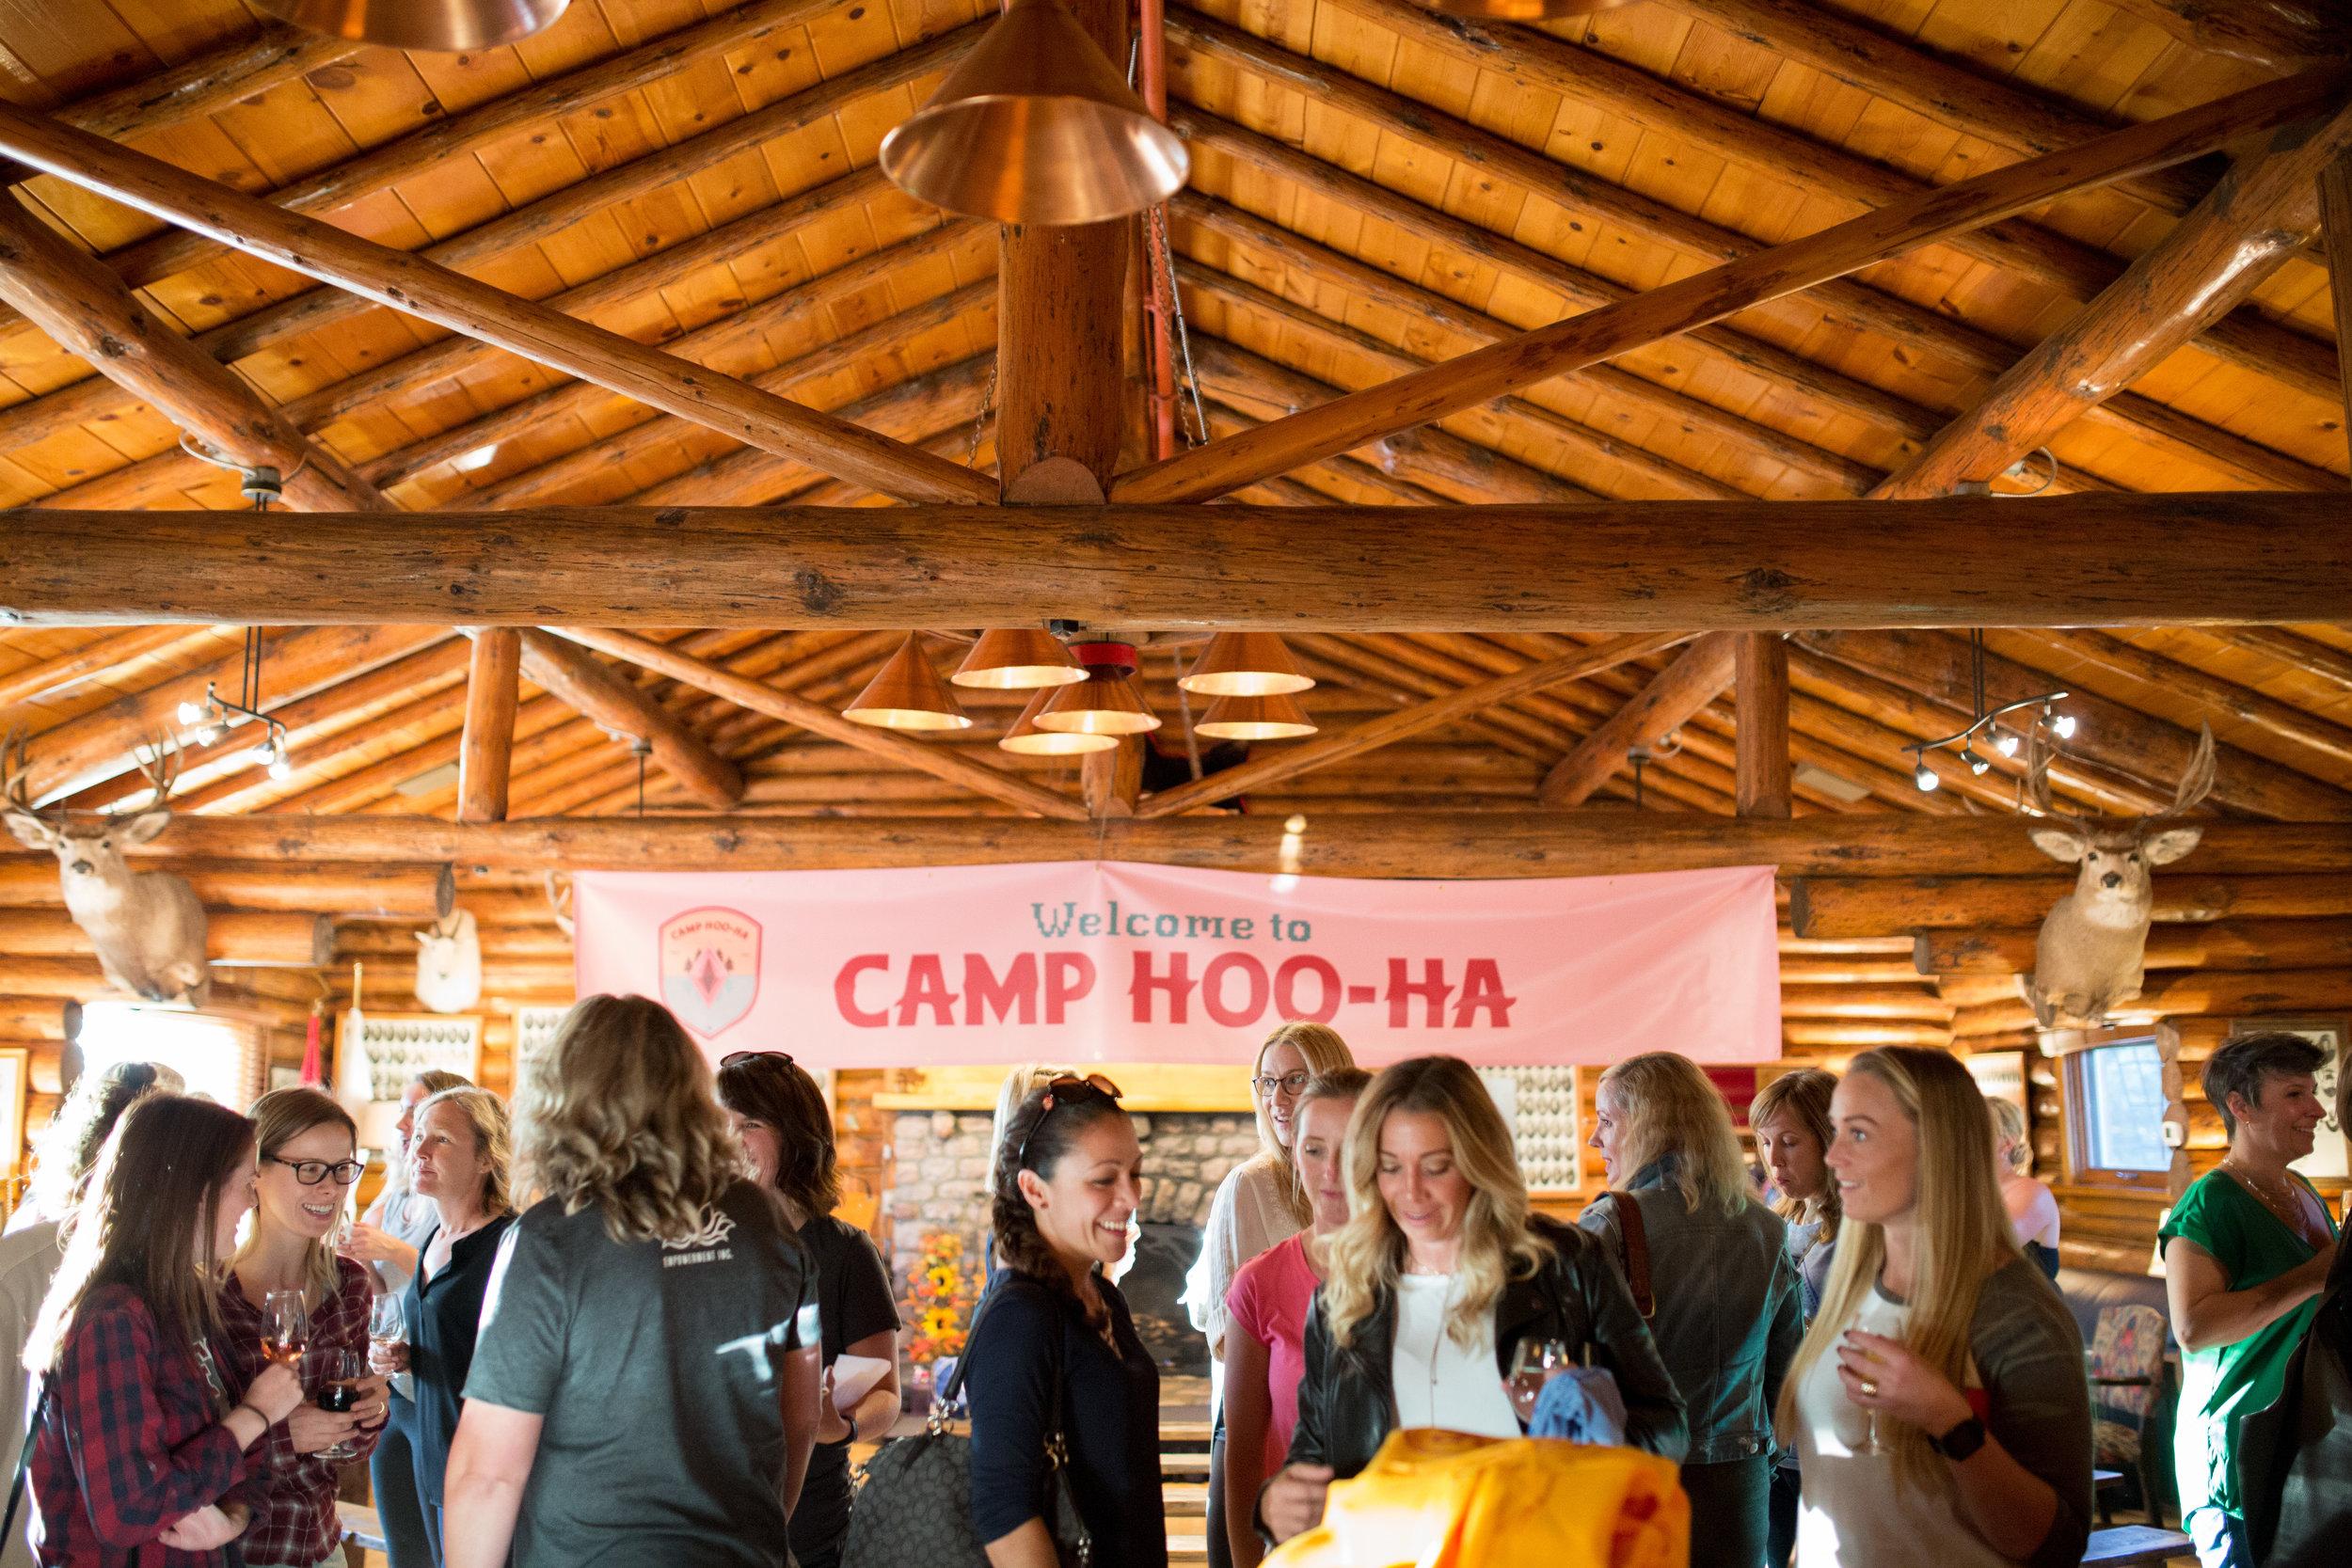 image provided by Camp Hoo-Ha